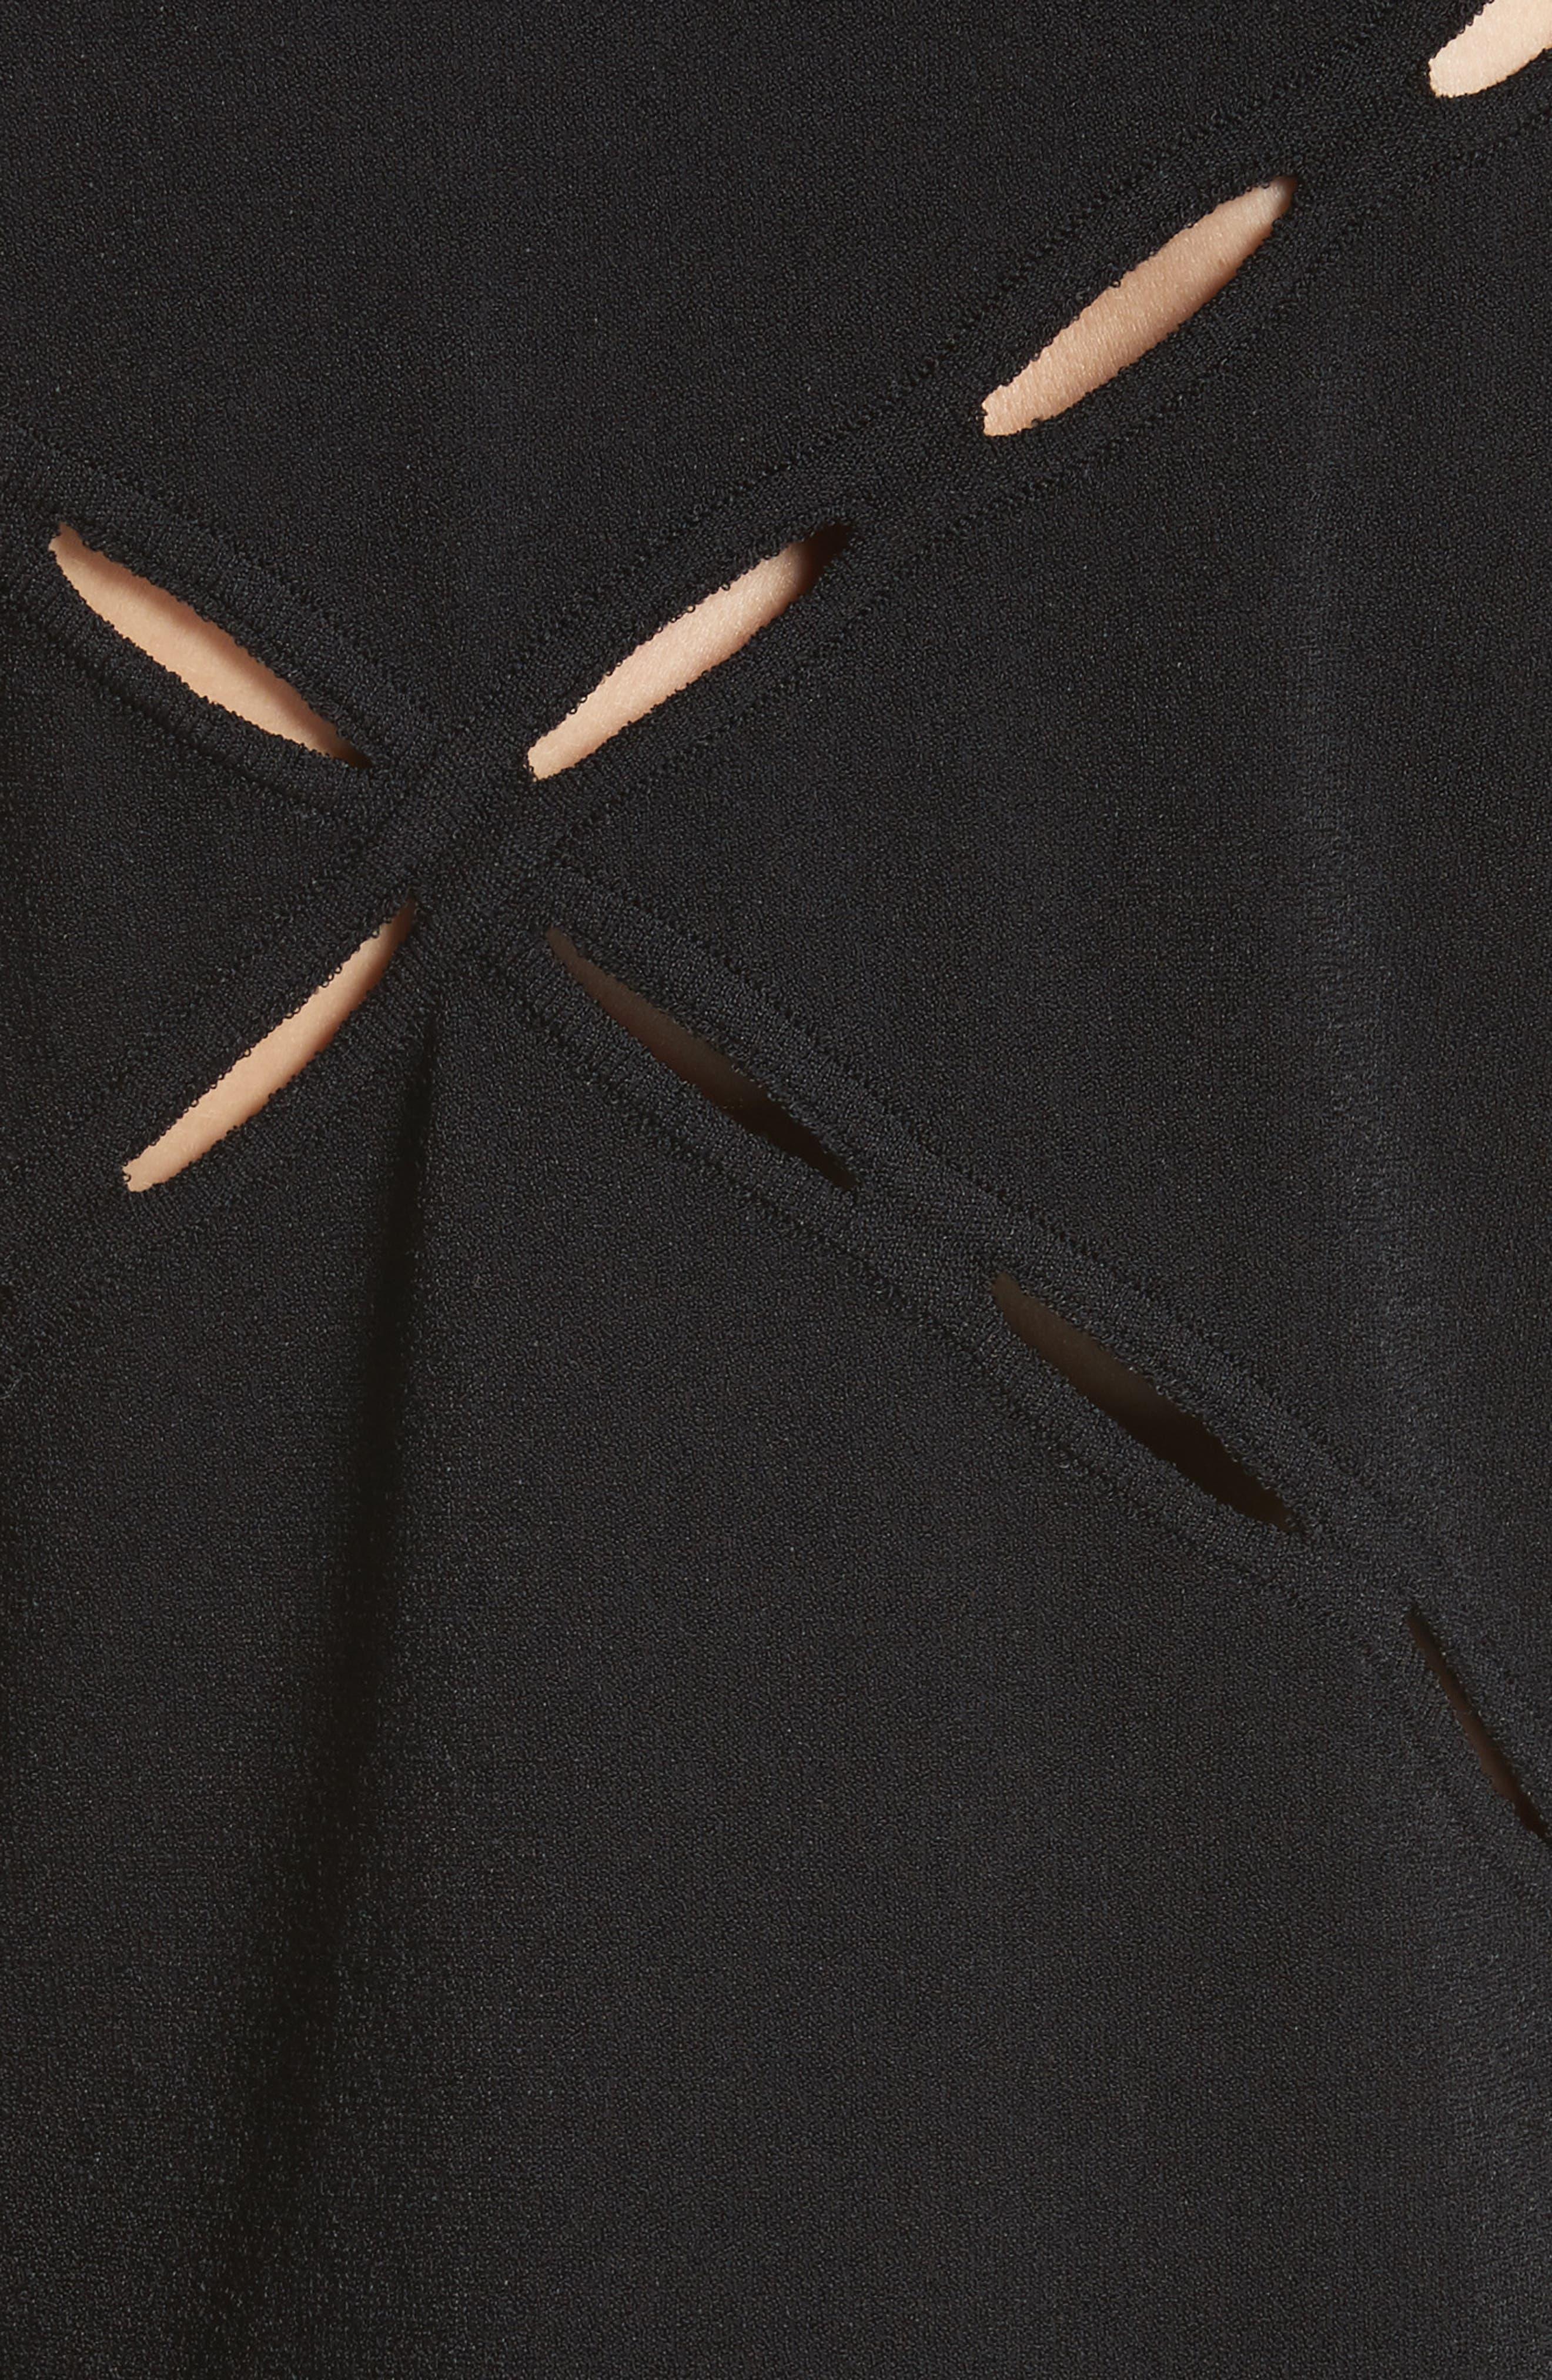 Eden Slash Detail Top,                             Alternate thumbnail 5, color,                             Black